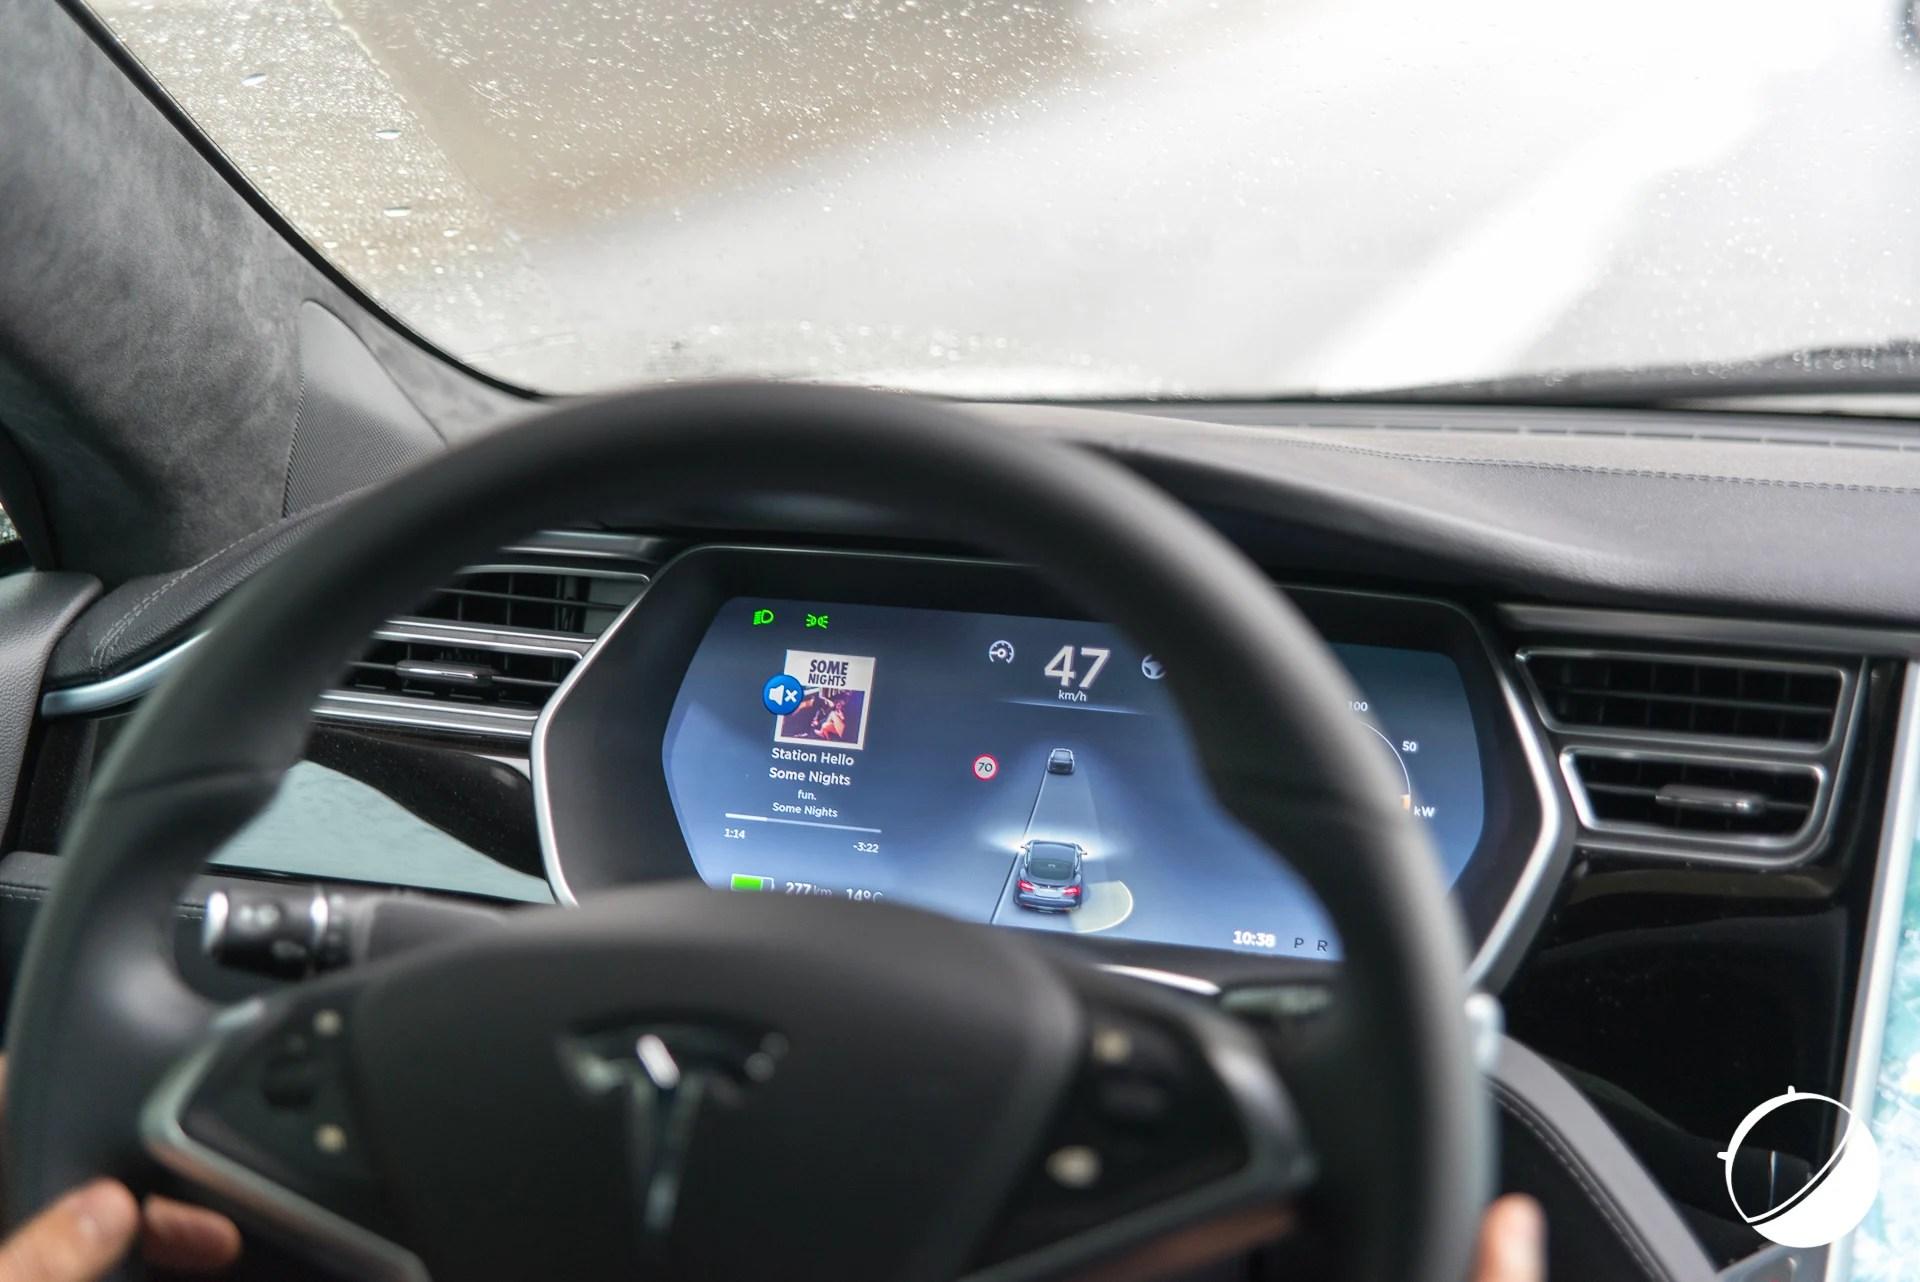 Tech'spresso : la 4G de Free, les MAJ du OnePlus 3 et la vitesse de la Tesla S